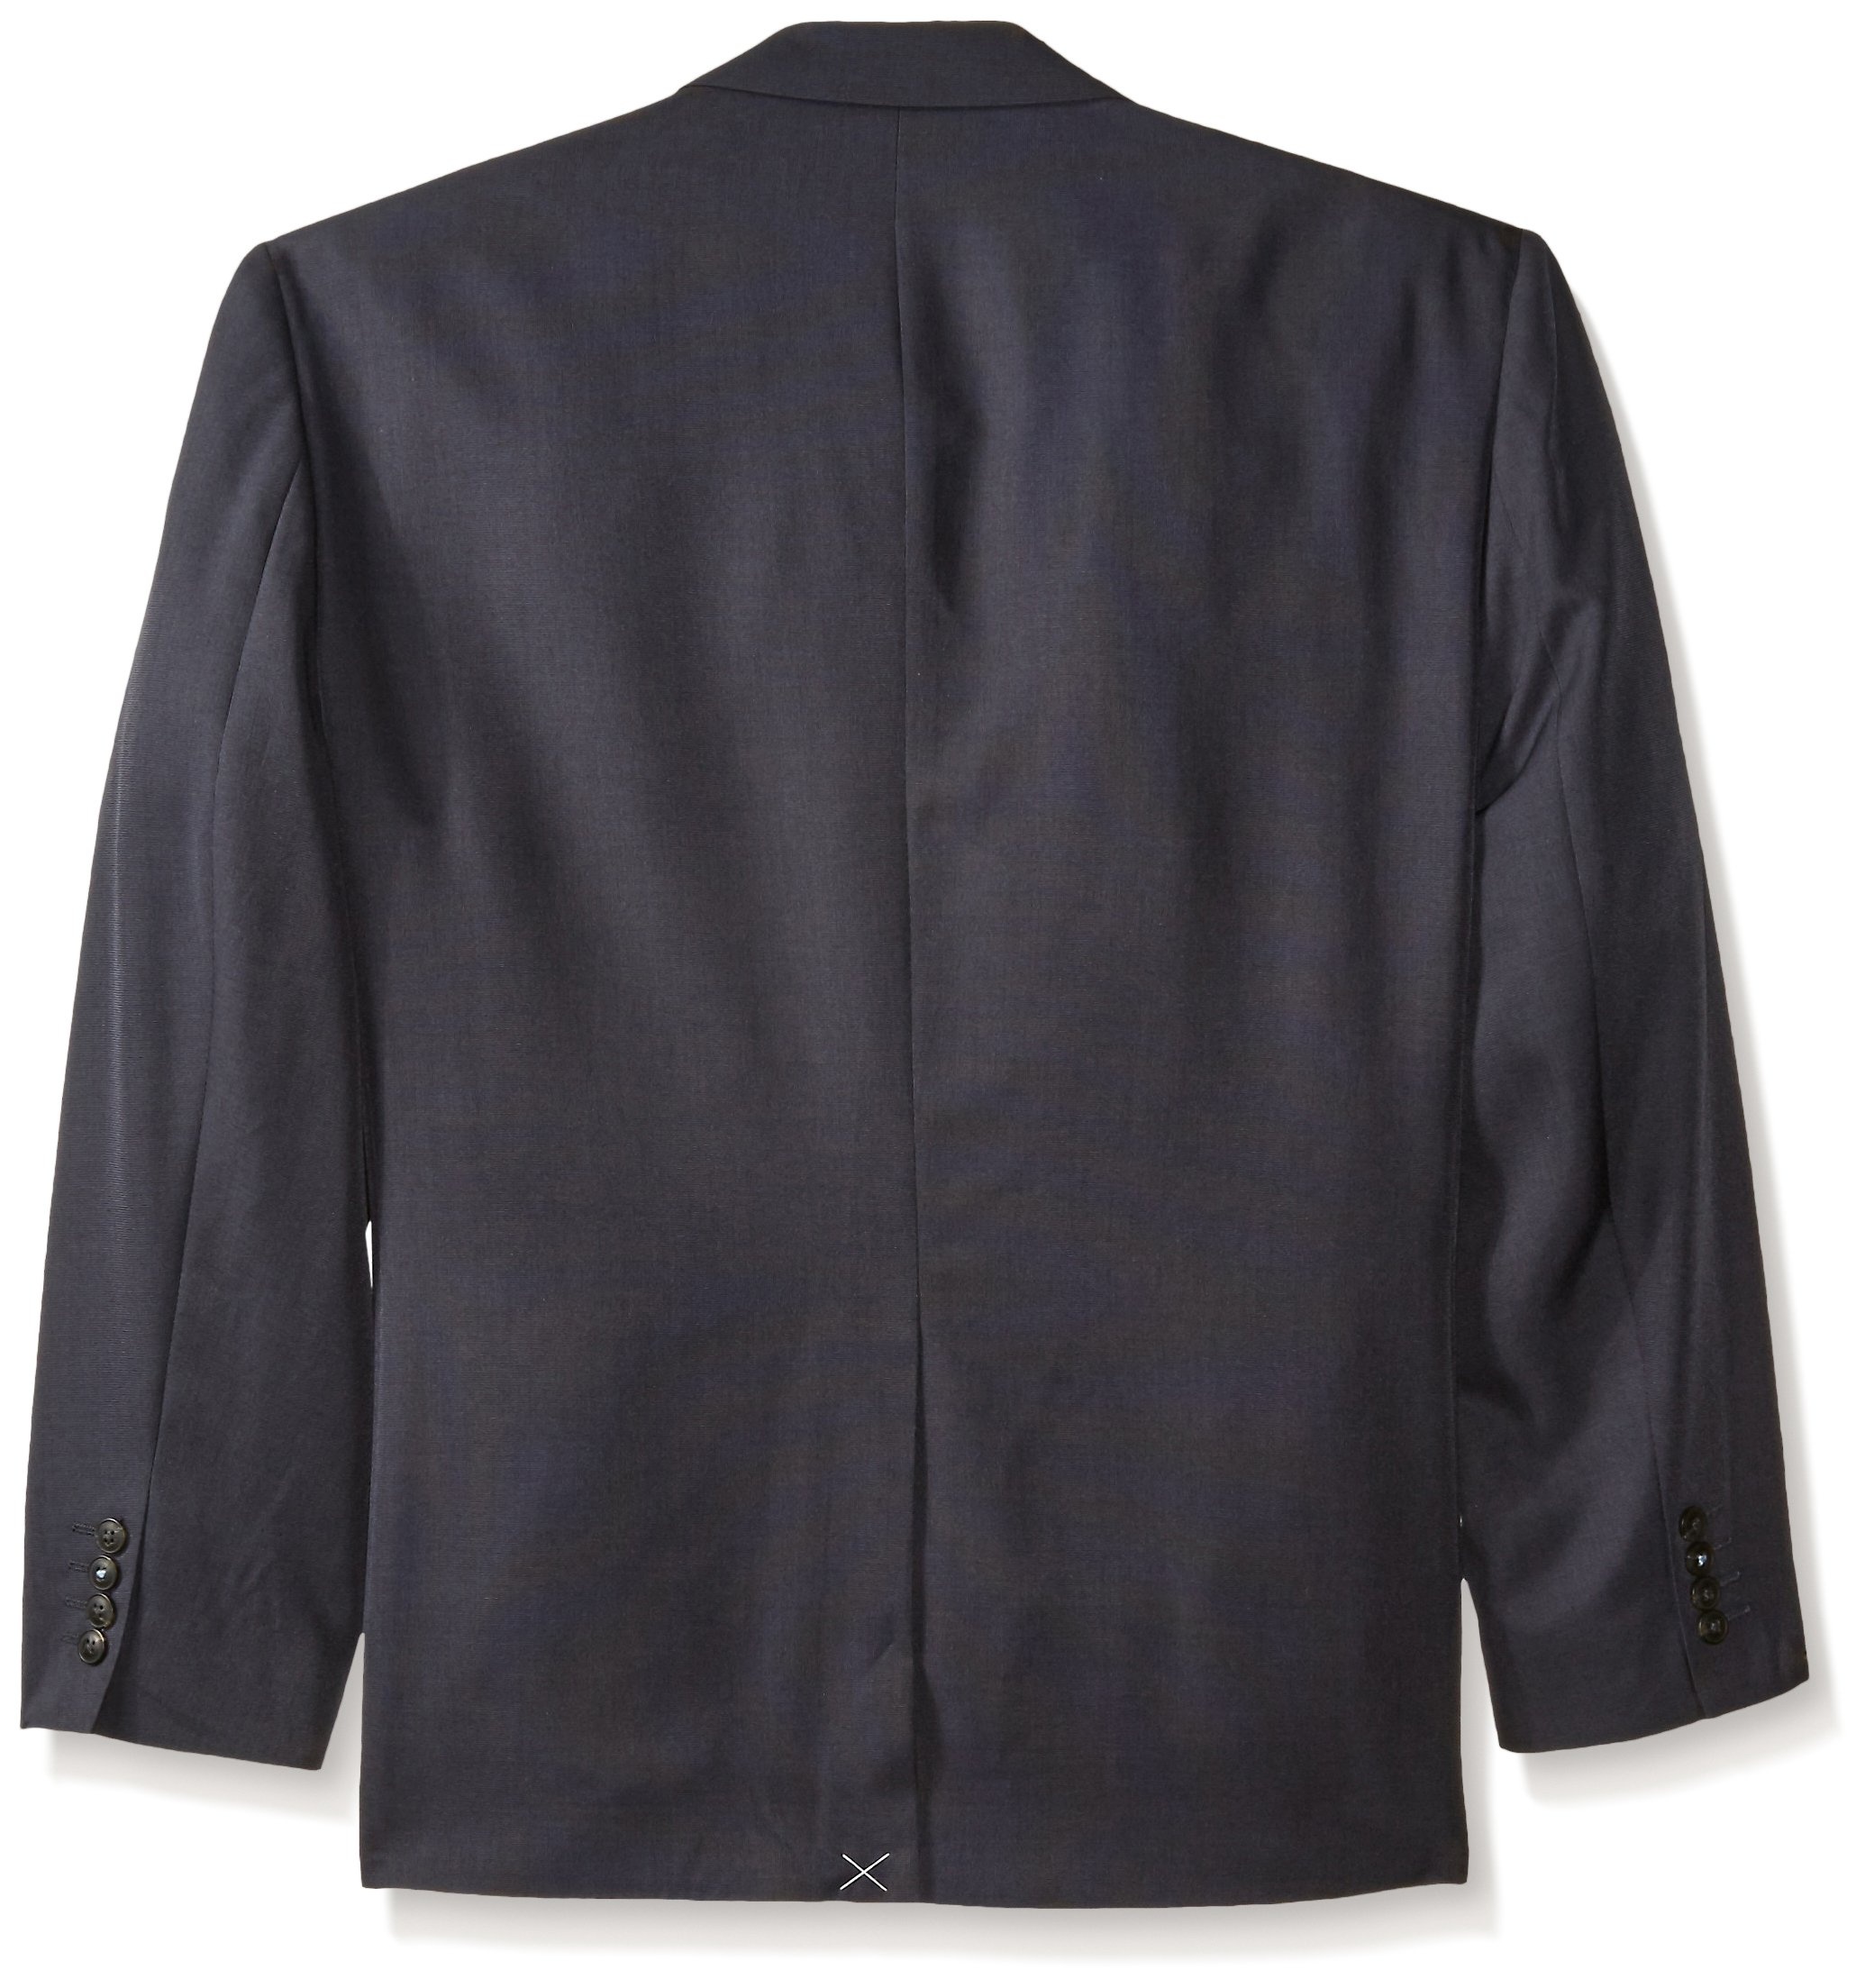 Haggar Men's Big-Tall Performance Tic Weave Classic Fit Suit Separate Coat, Navy, 50 Regular by Haggar (Image #2)